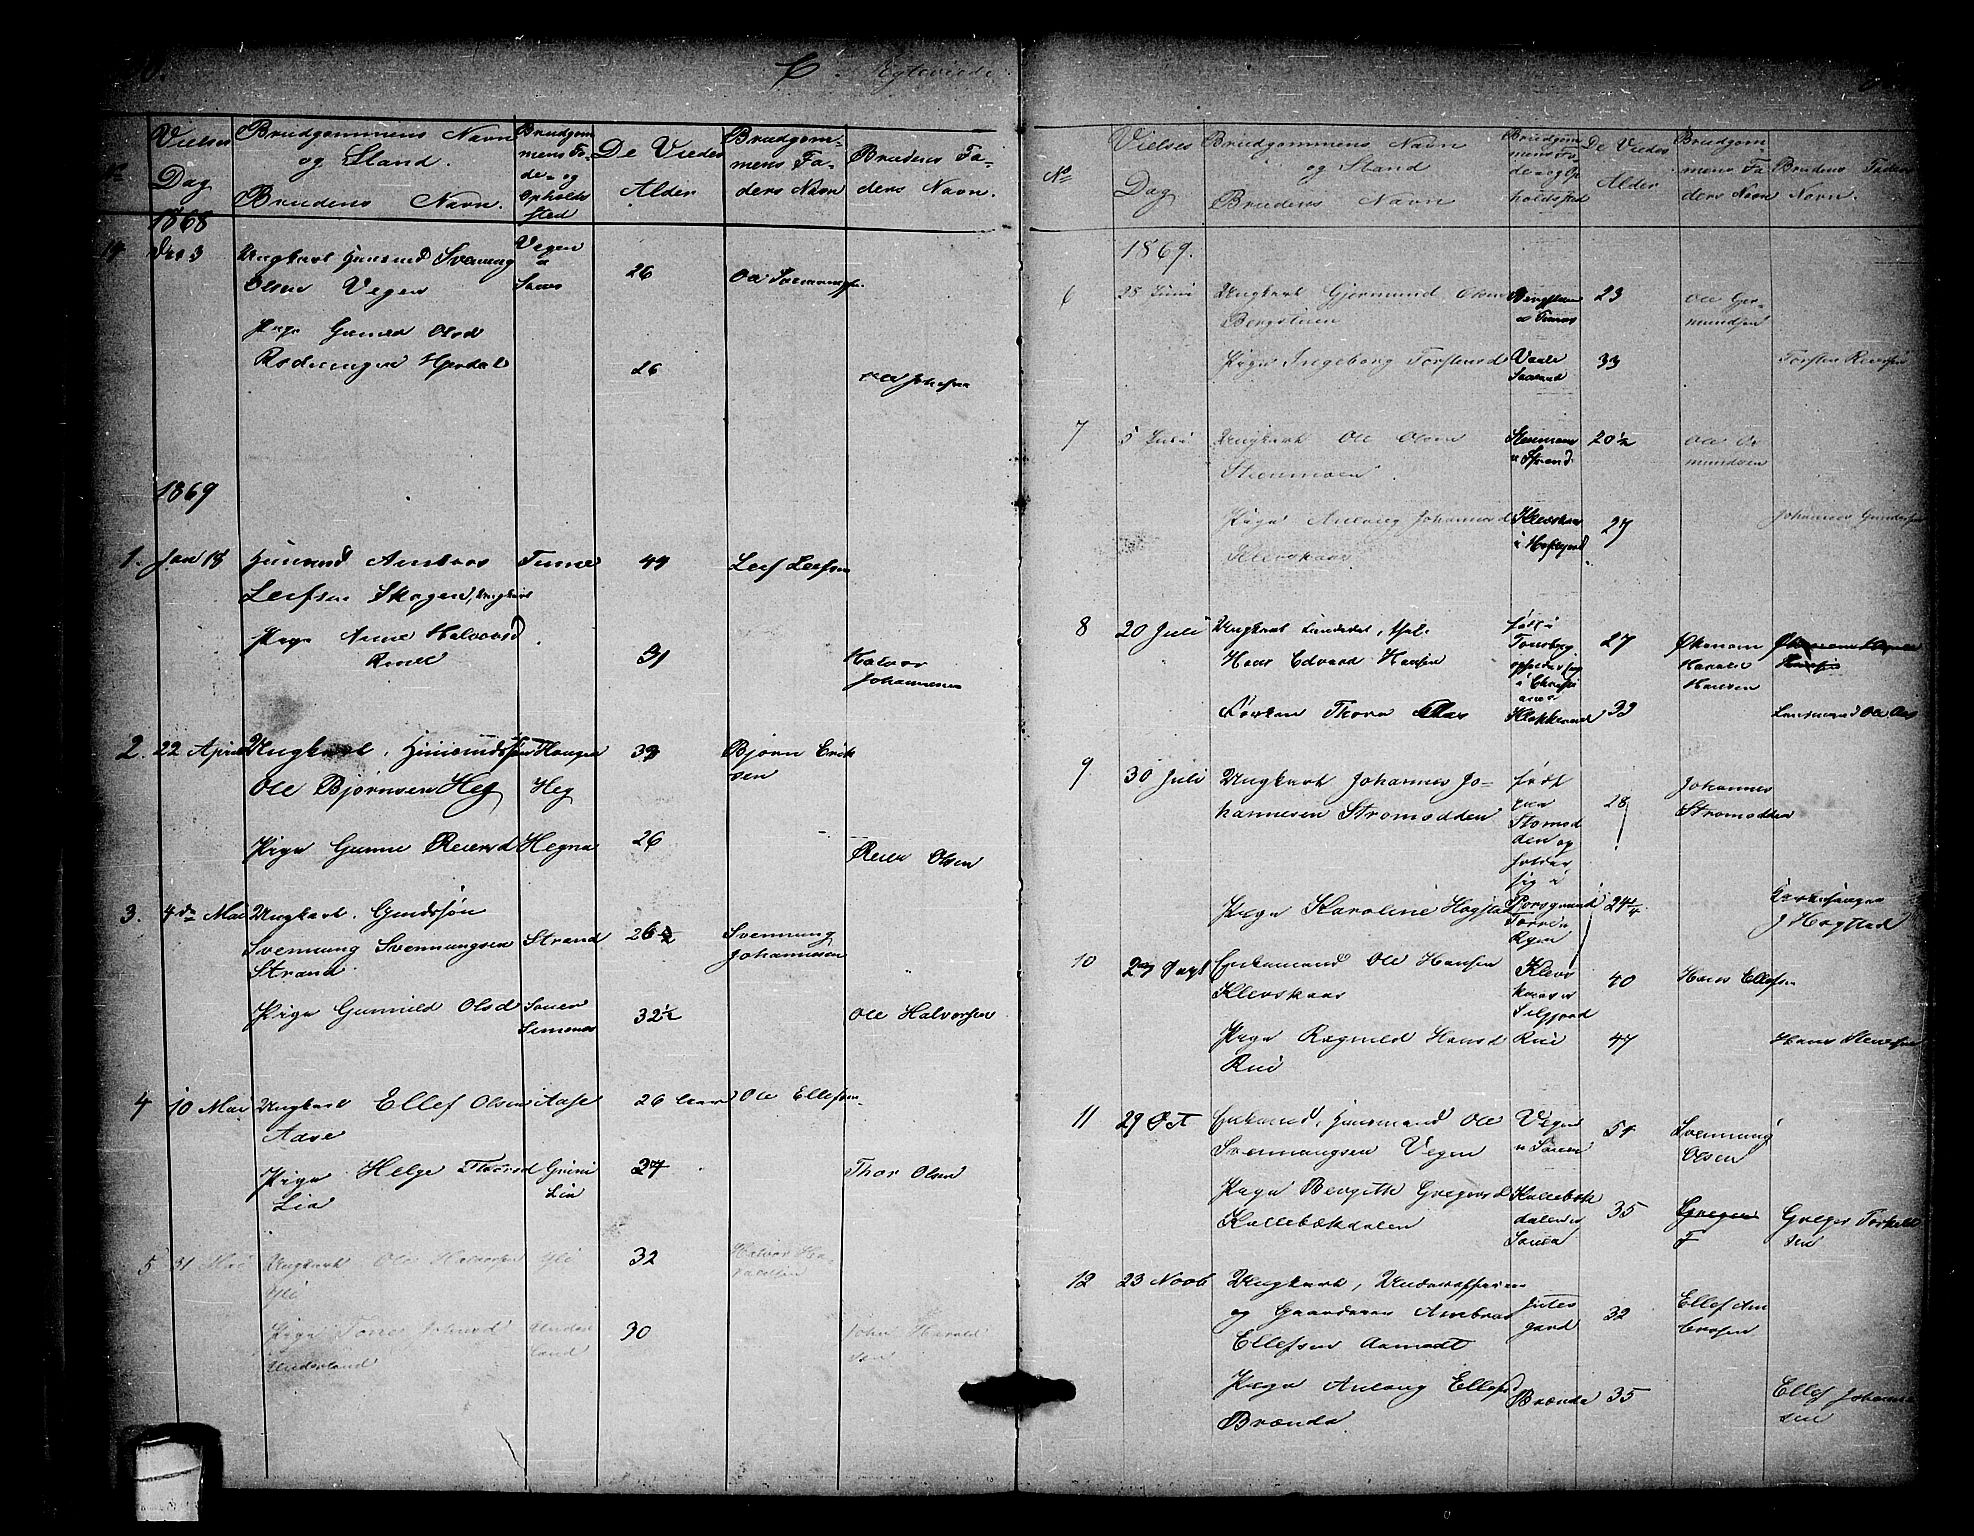 SAKO, Heddal kirkebøker, G/Ga/L0001: Klokkerbok nr. I 1, 1866-1878, s. 300-301